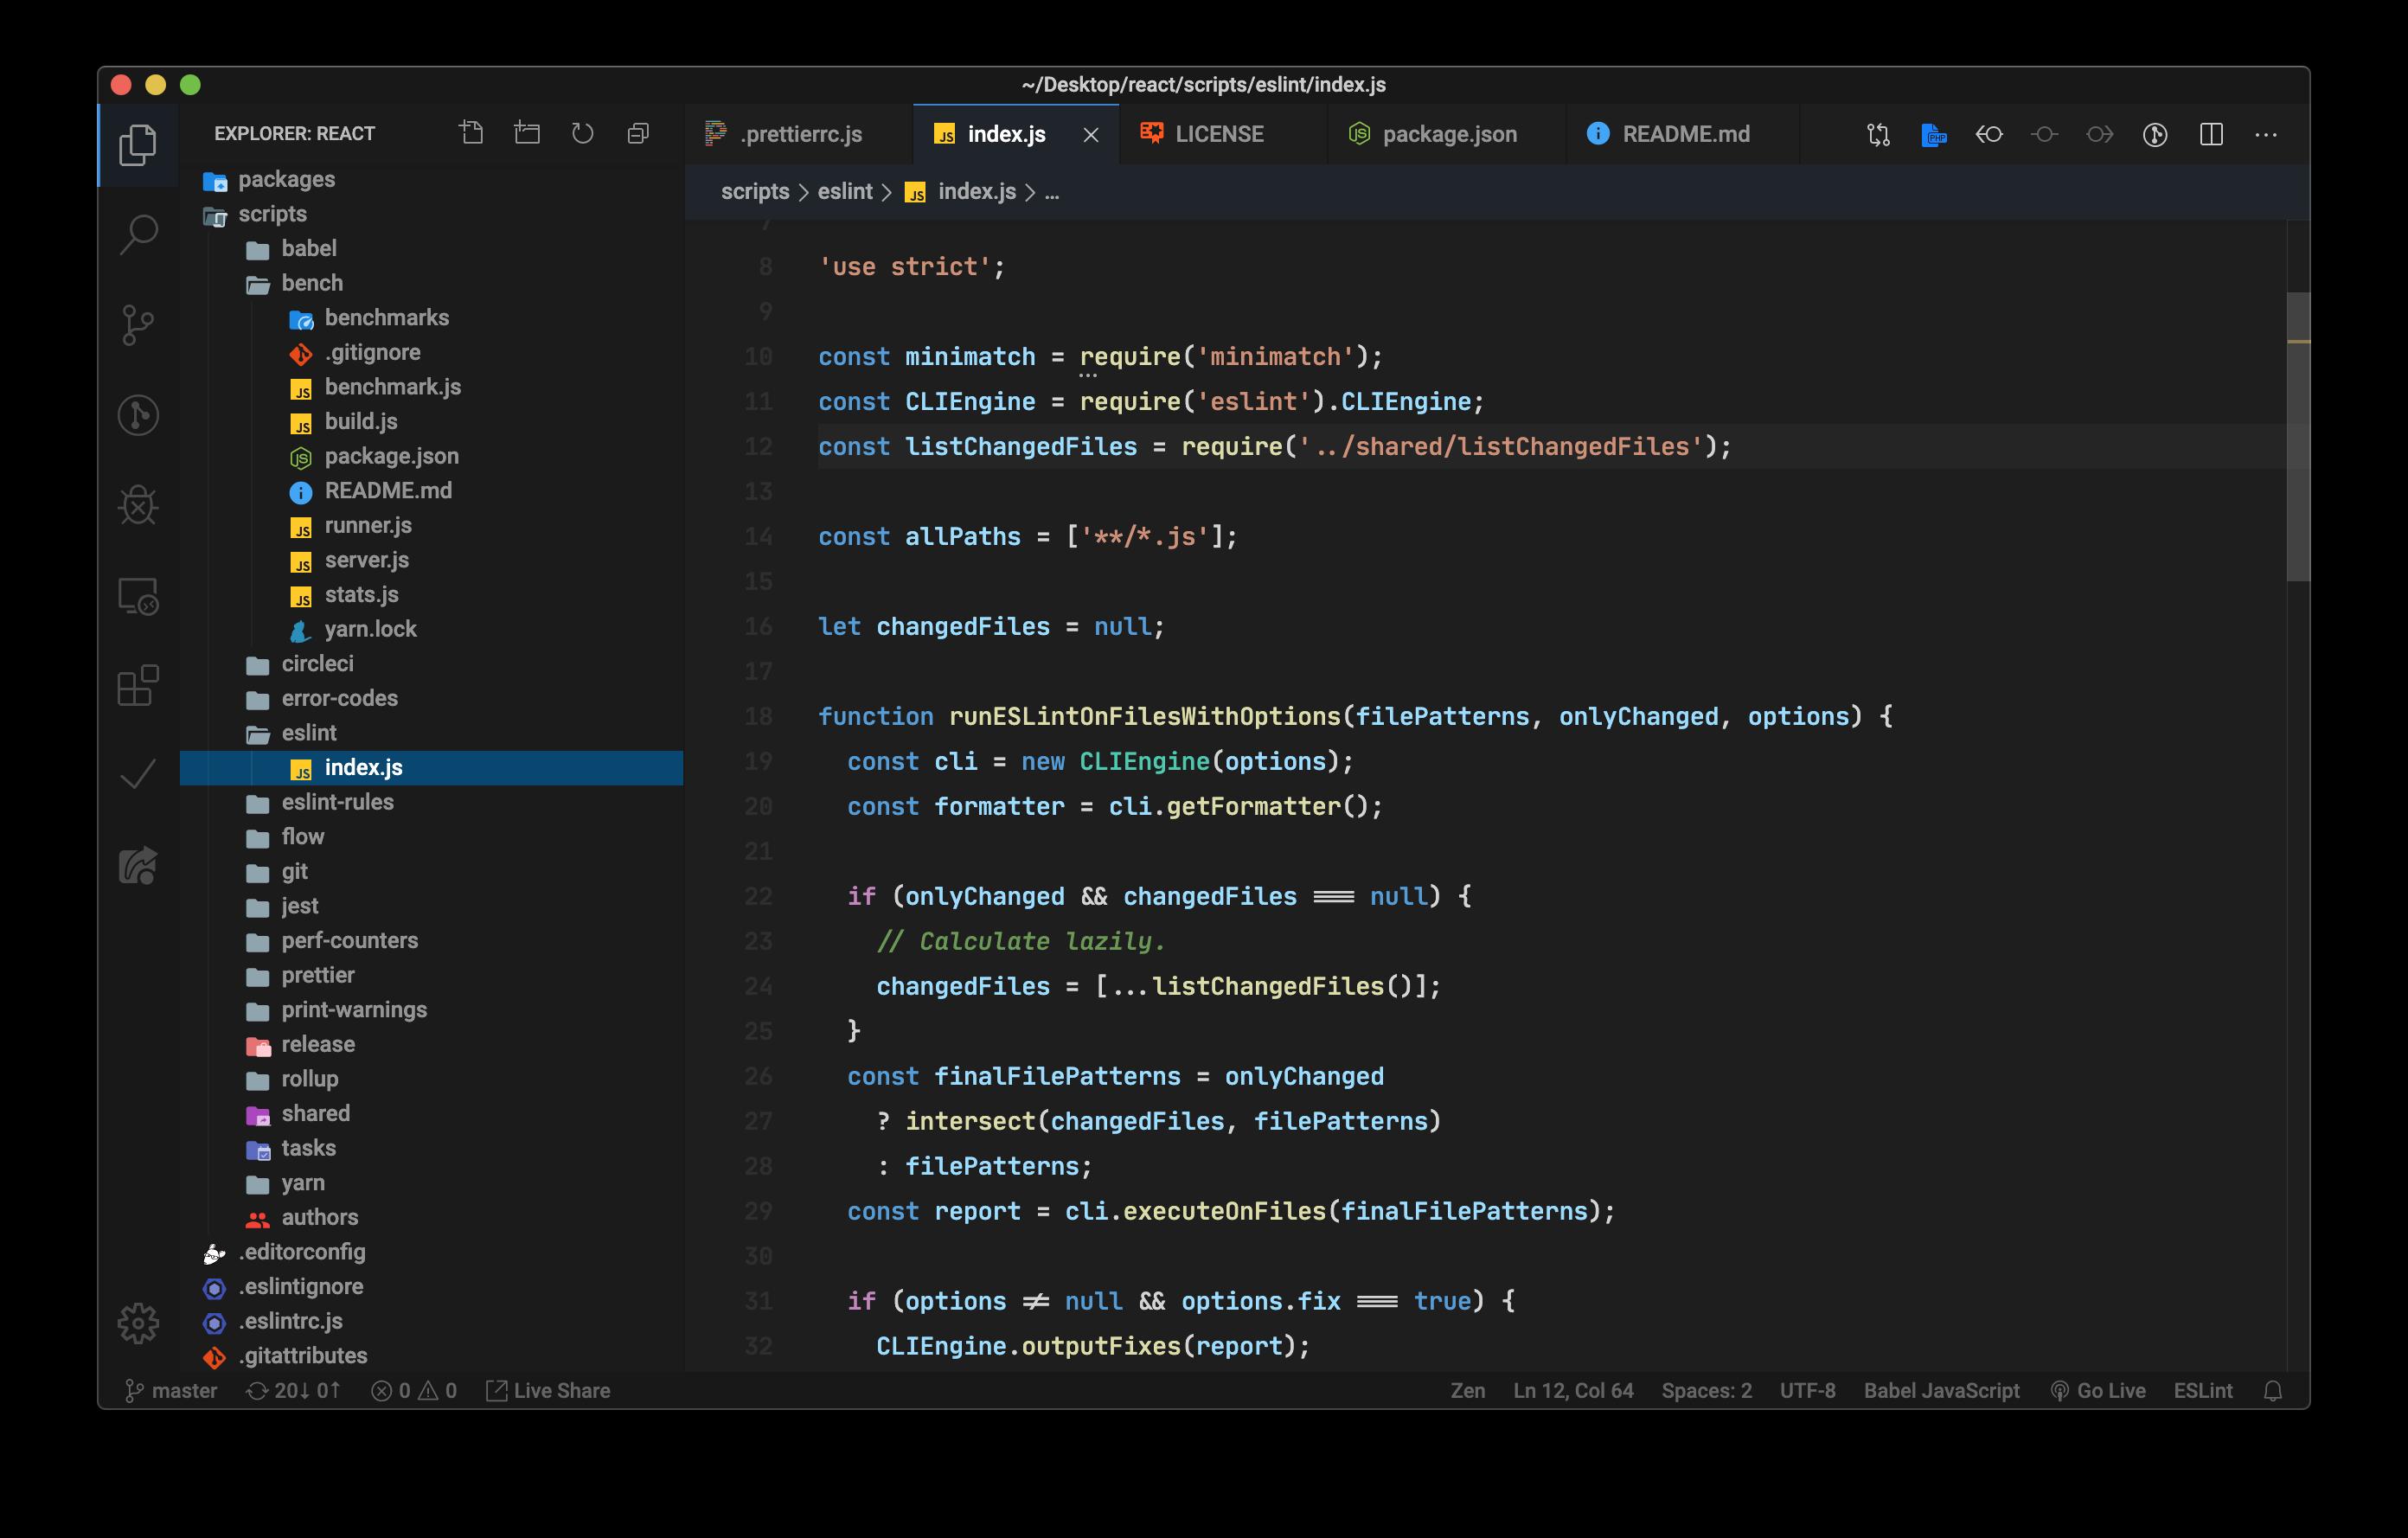 Syntax highlight: Javascript